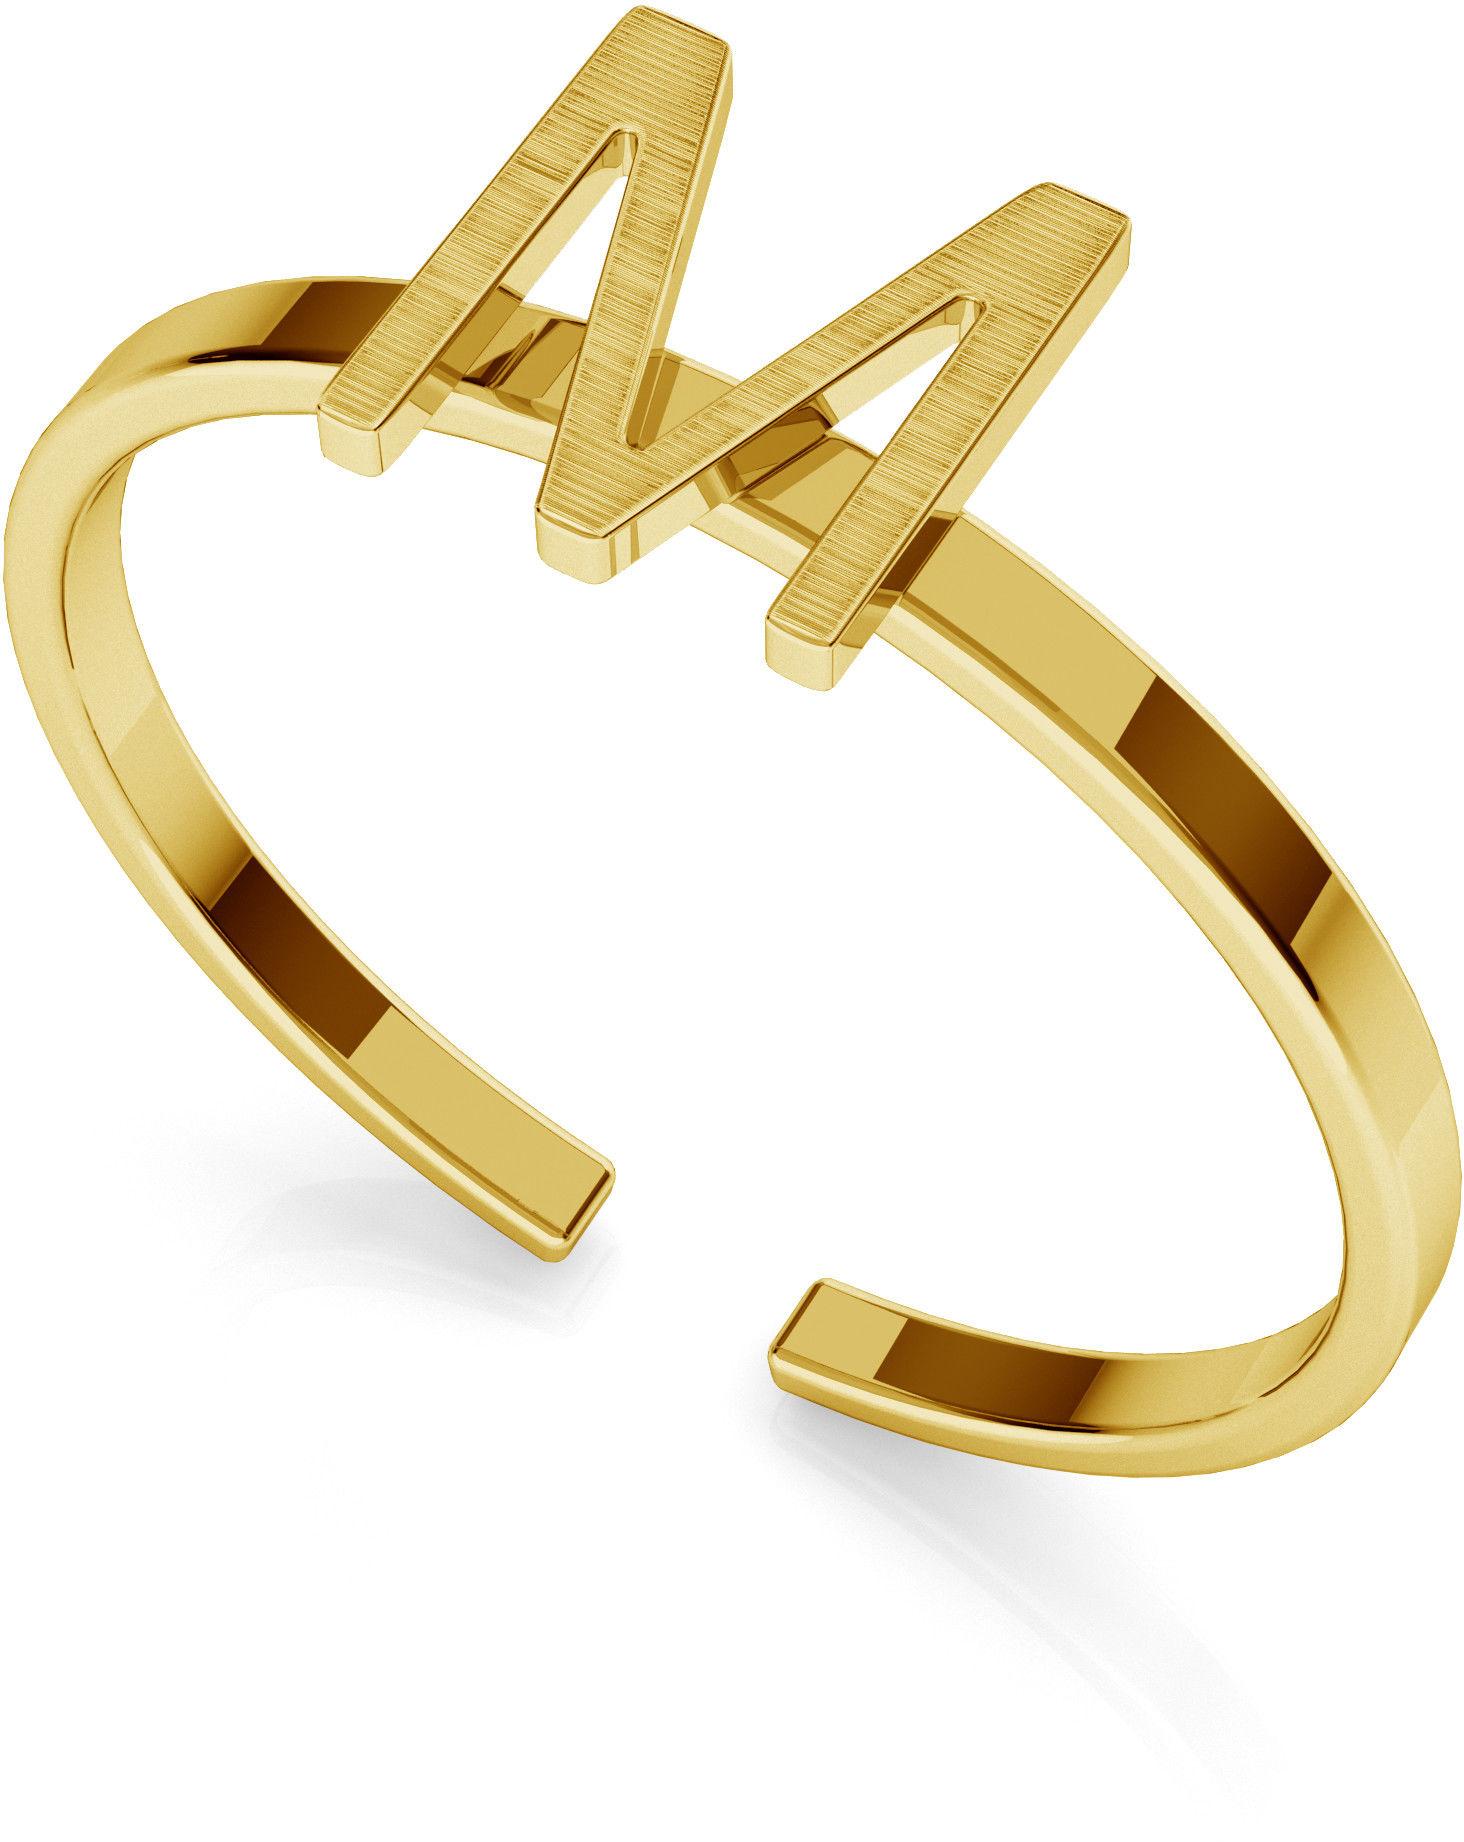 Srebrny pierścionek z literką My RING, srebro 925 : Litera - B, Srebro - kolor pokrycia - Pokrycie platyną